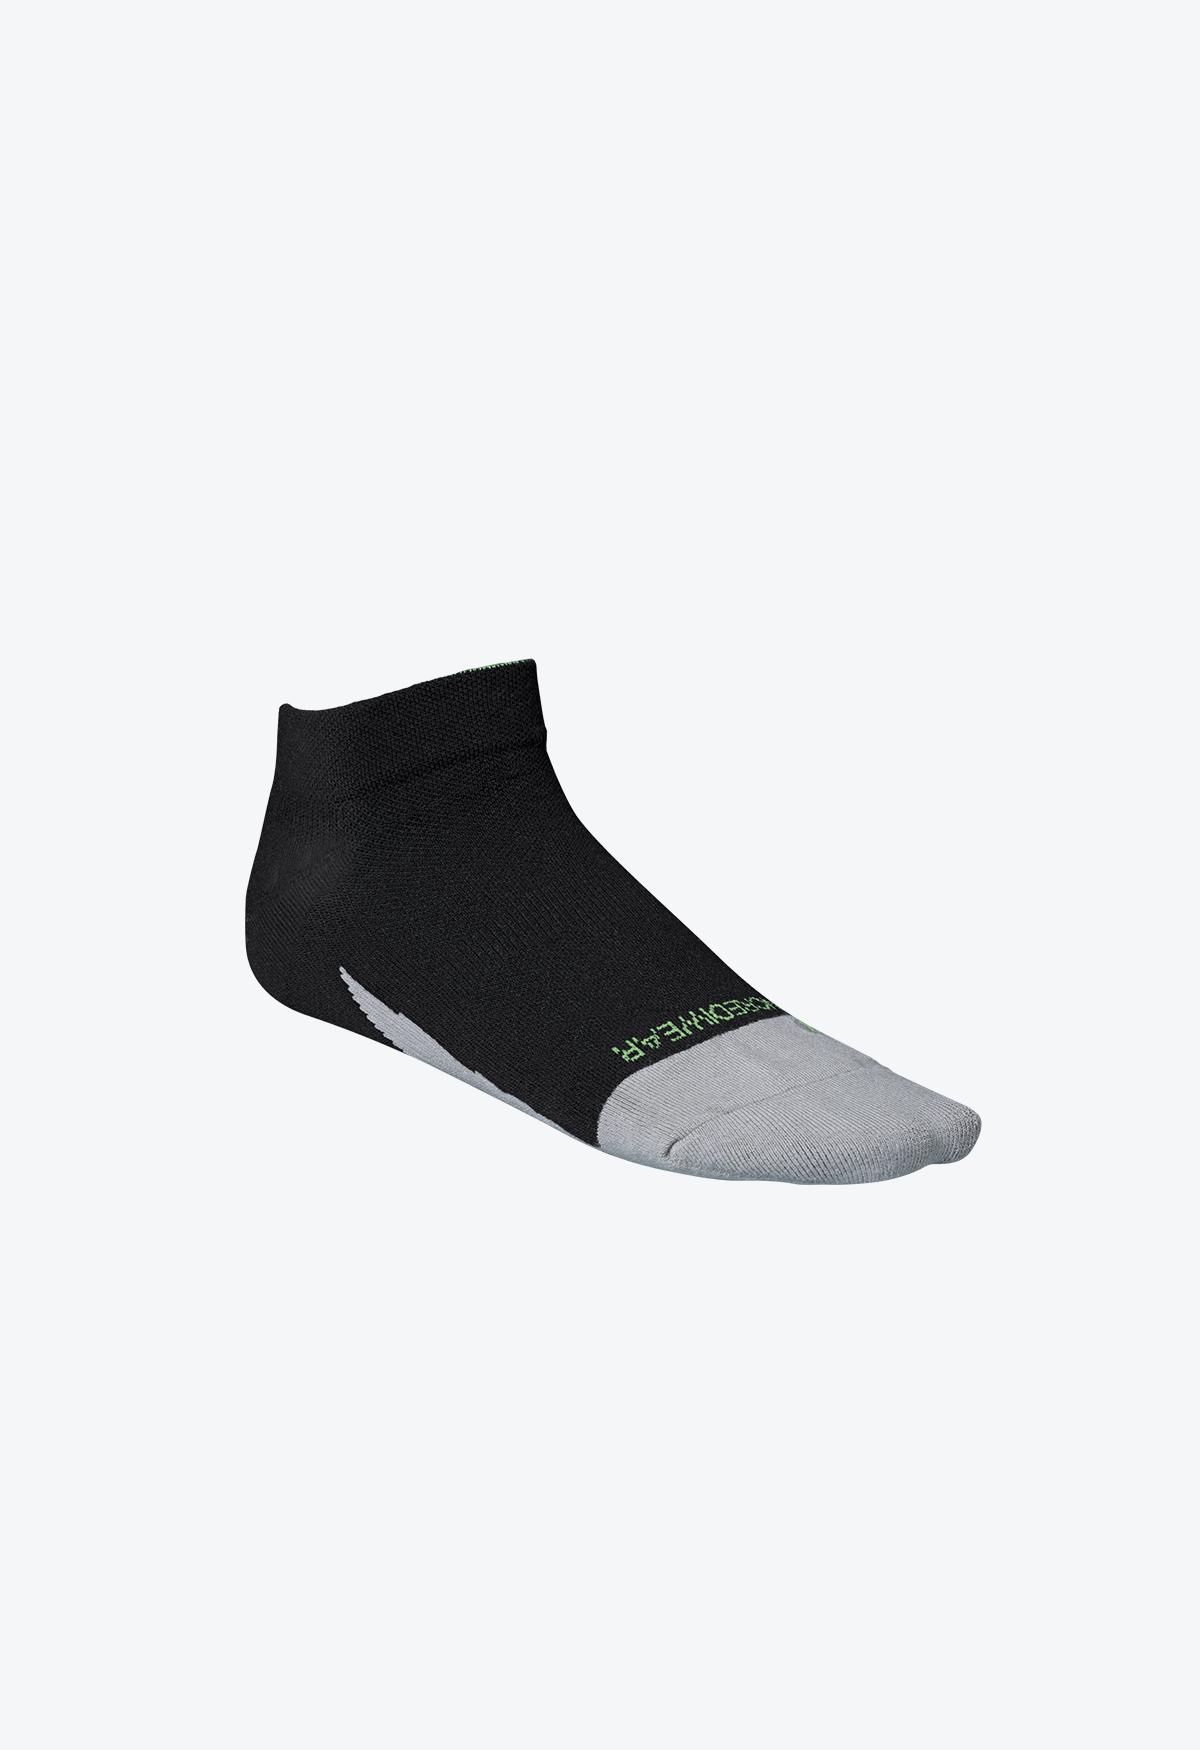 Golf_Socks_Low_Left